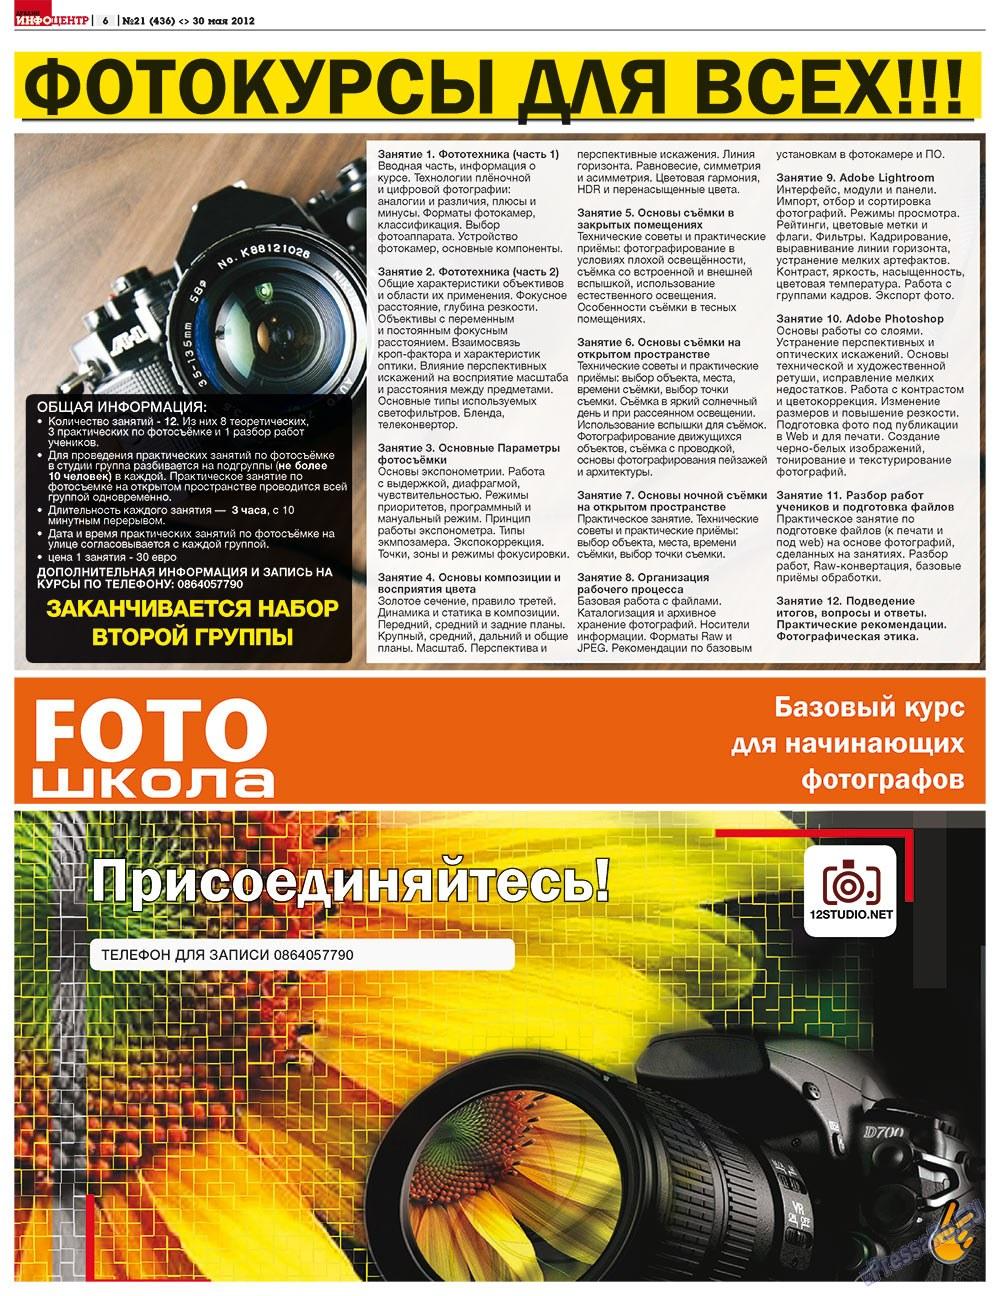 Дублин инфоцентр (газета). 2012 год, номер 21, стр. 6